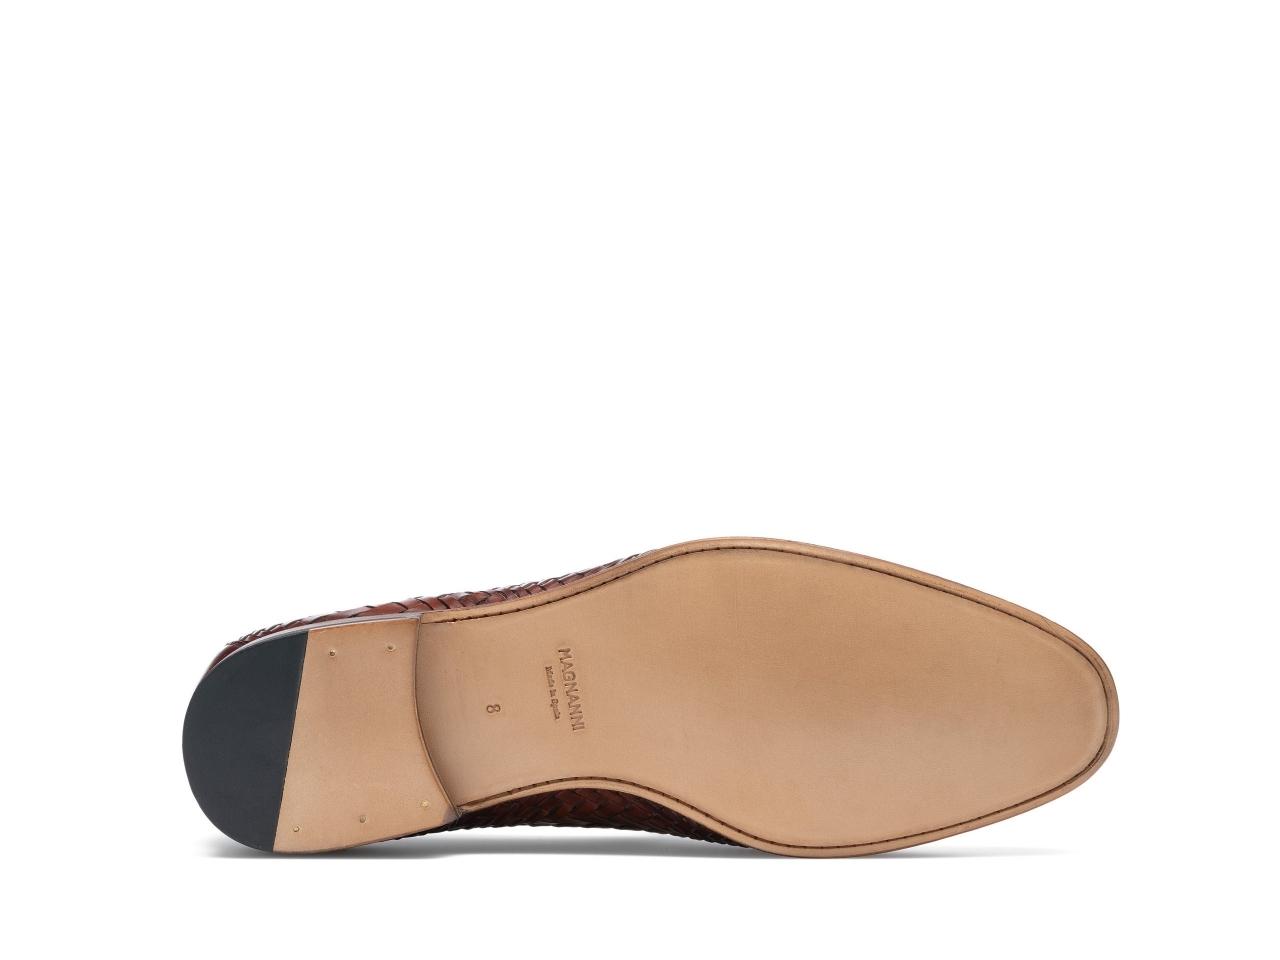 The sole of the Herrera